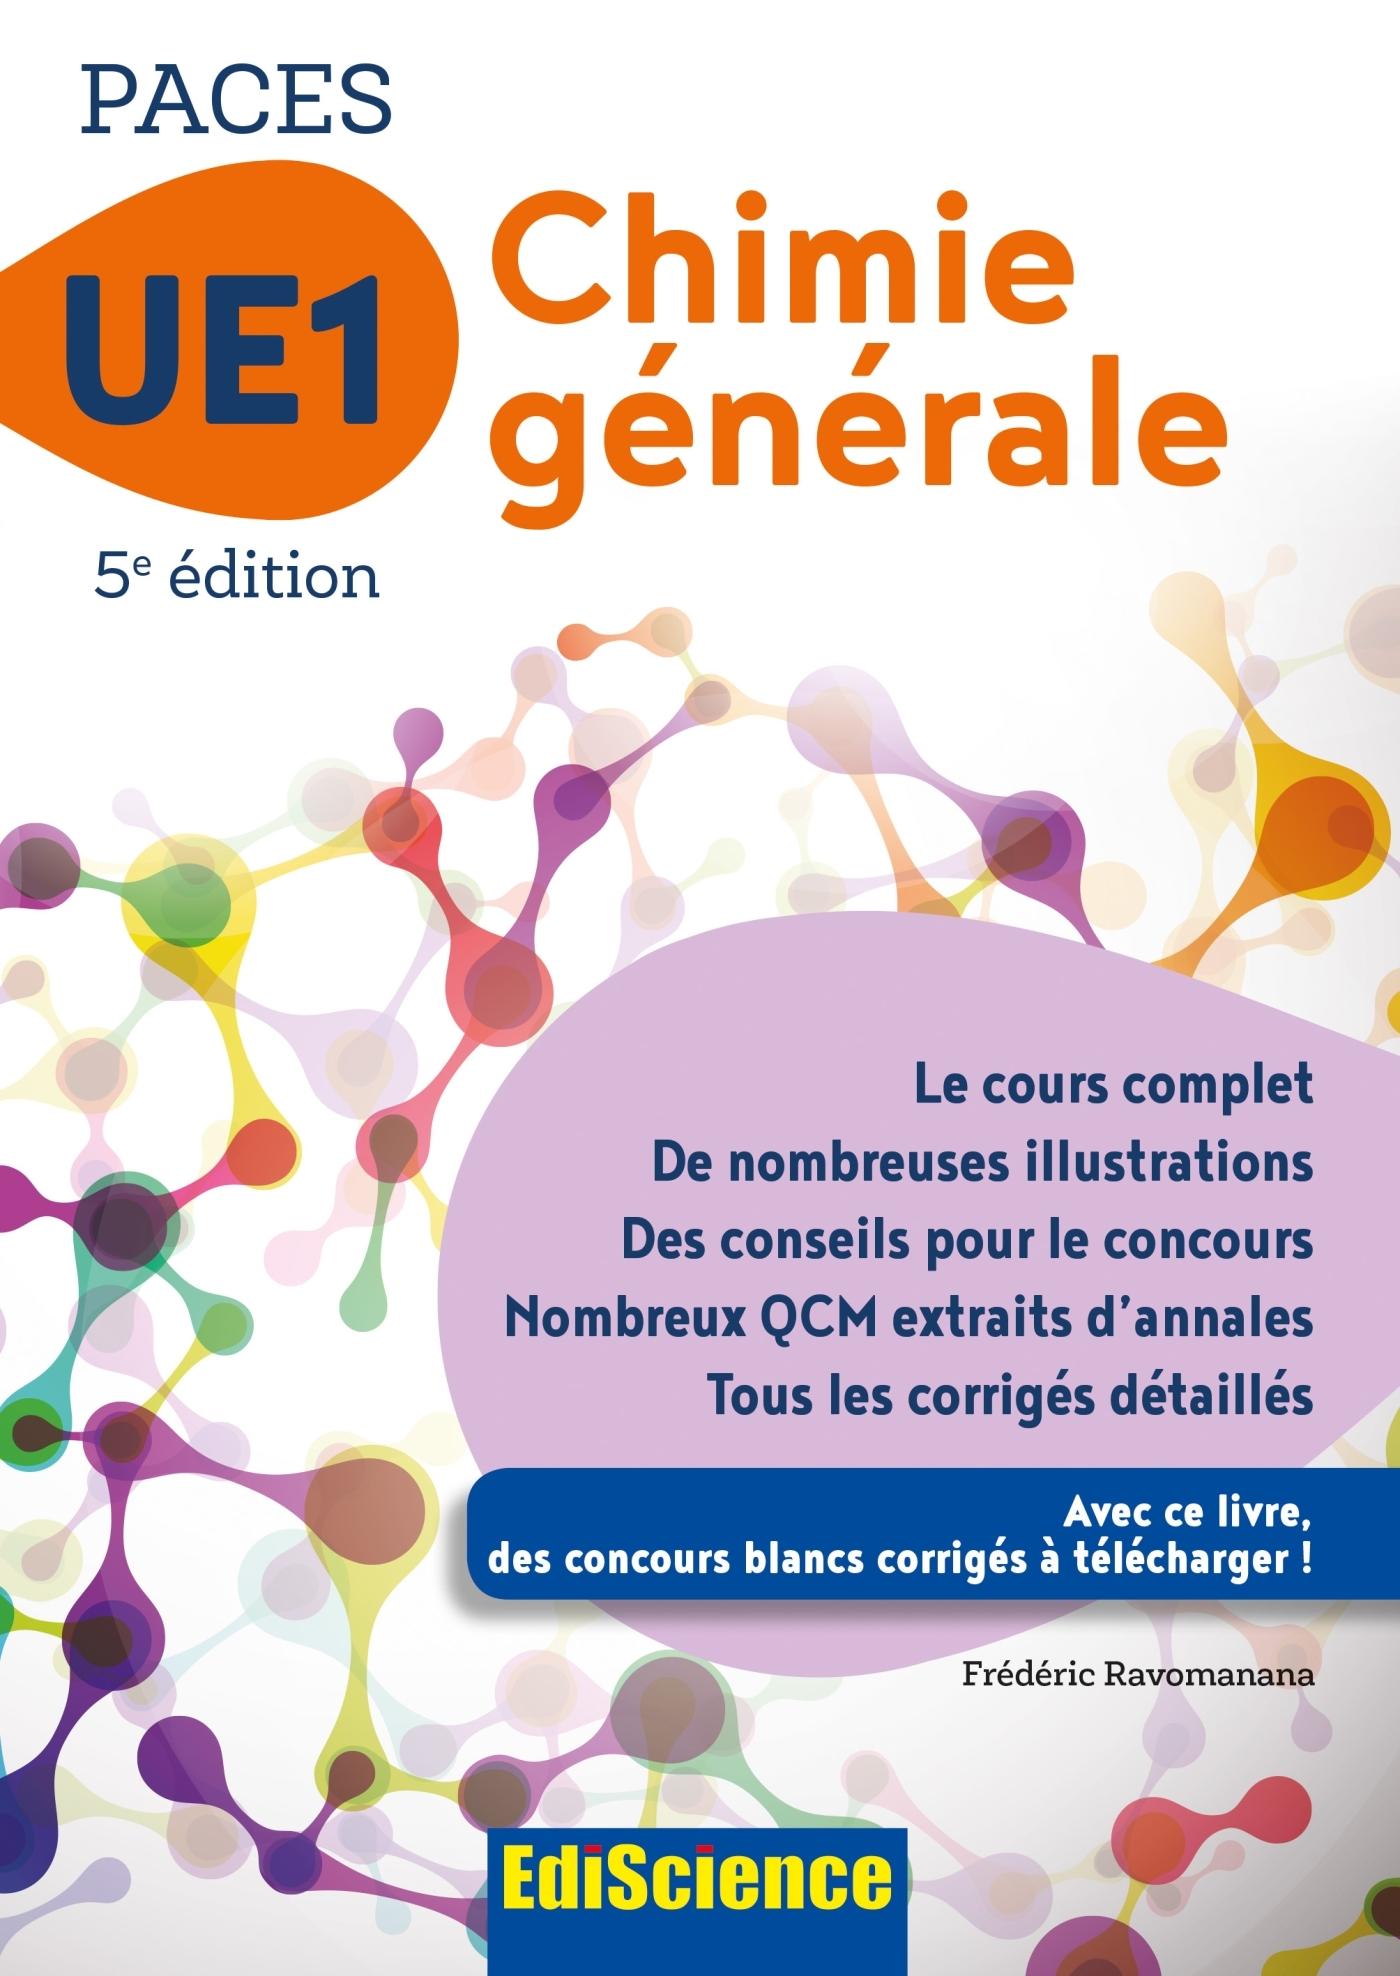 PACES UE1 CHIMIE GENERALE - 5E ED.